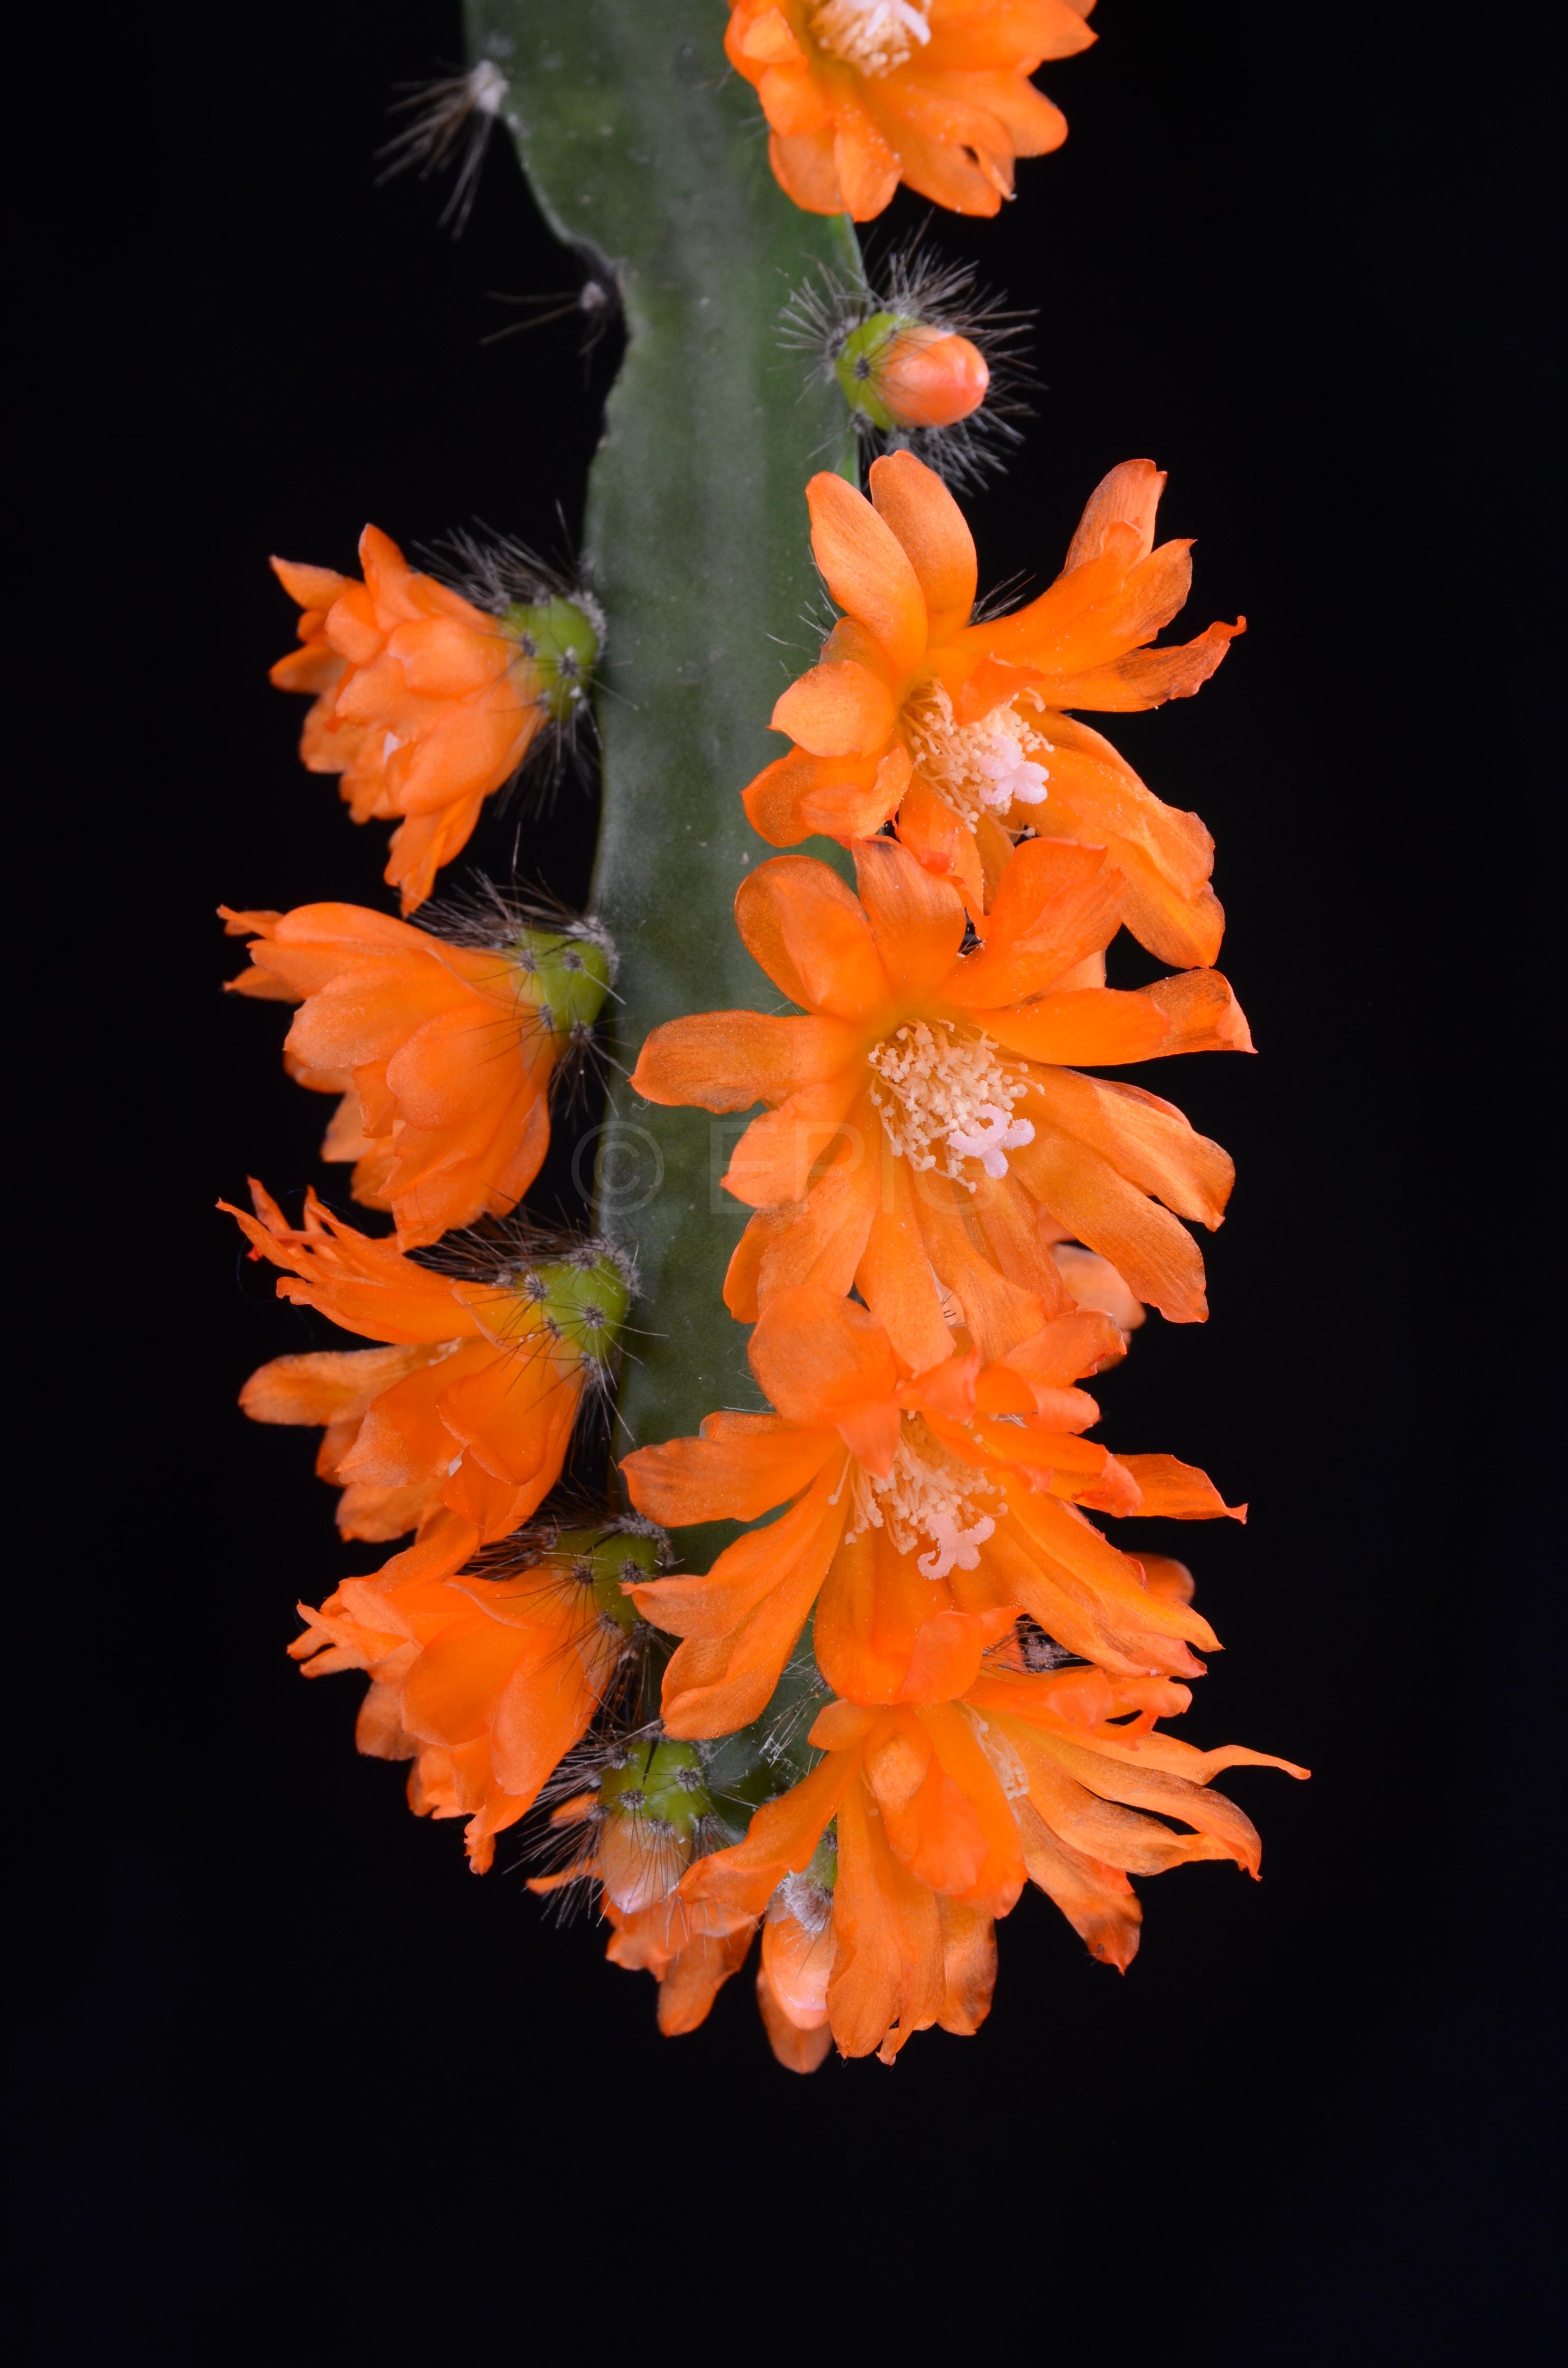 Pfeiffera miyagawae ISI 98-1 (Foto Andreas Hofacker)